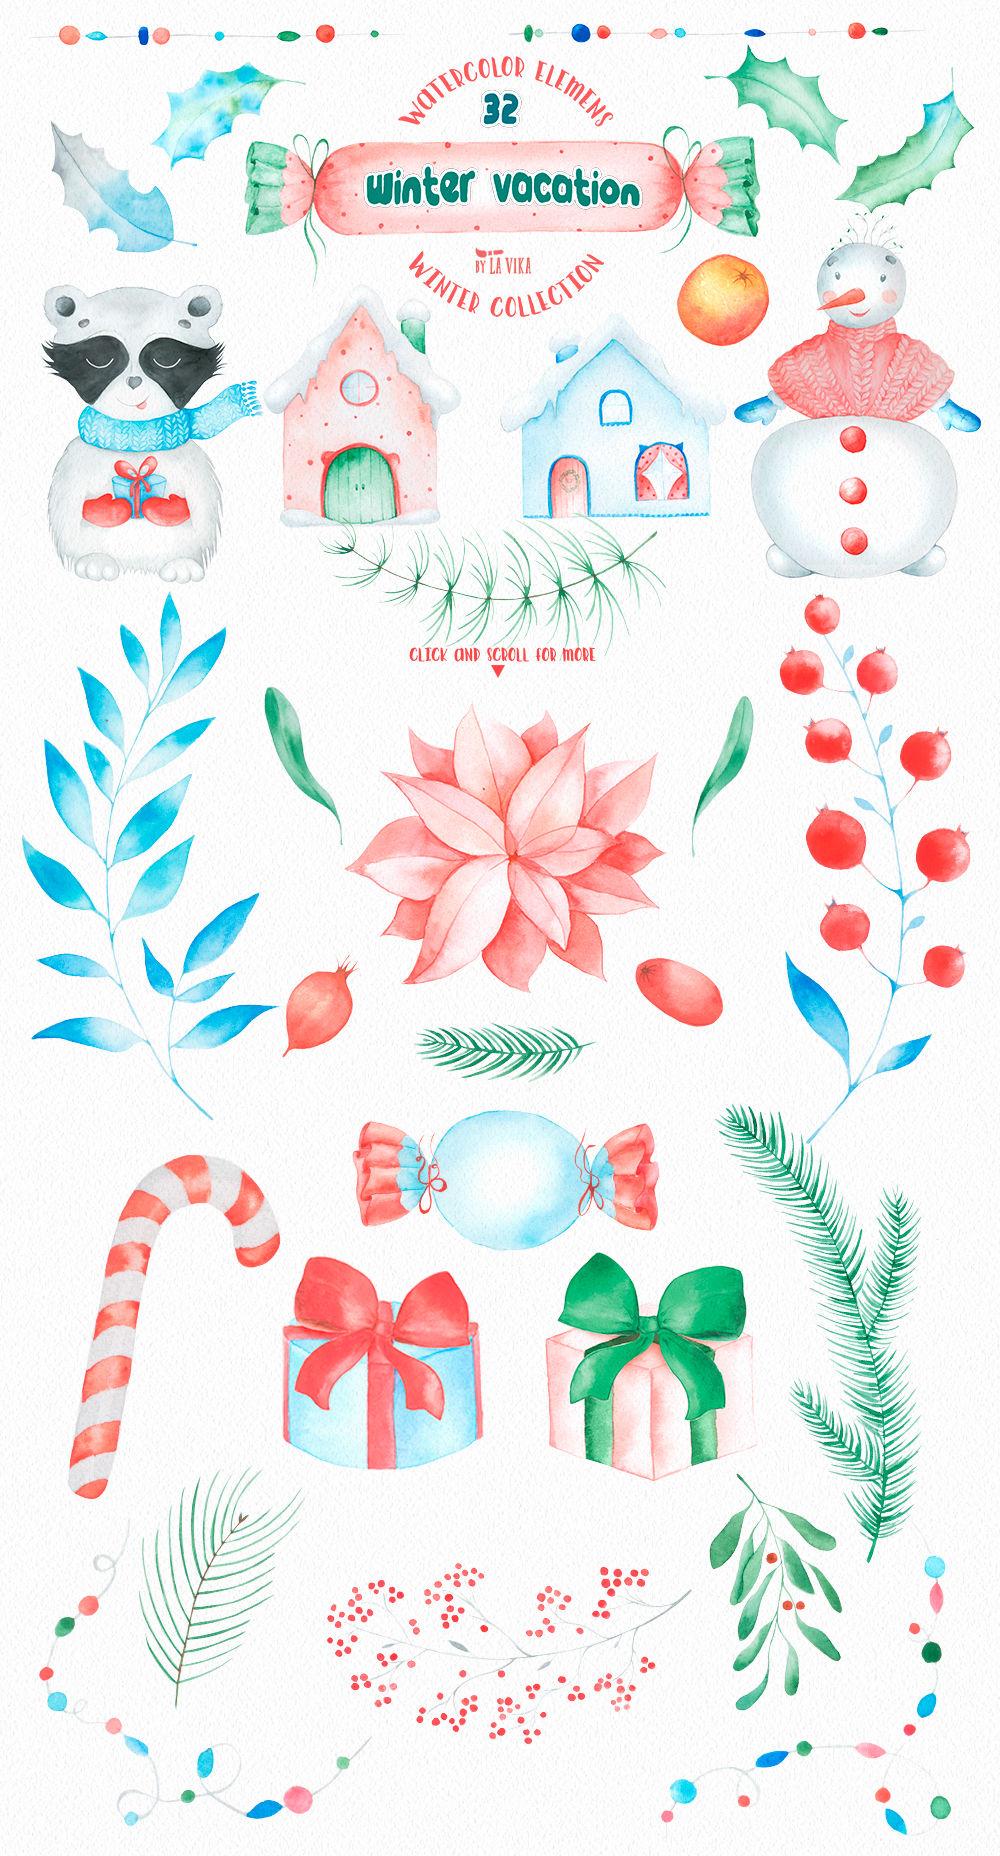 medium resolution of  watercolor winter clipart winter vacation